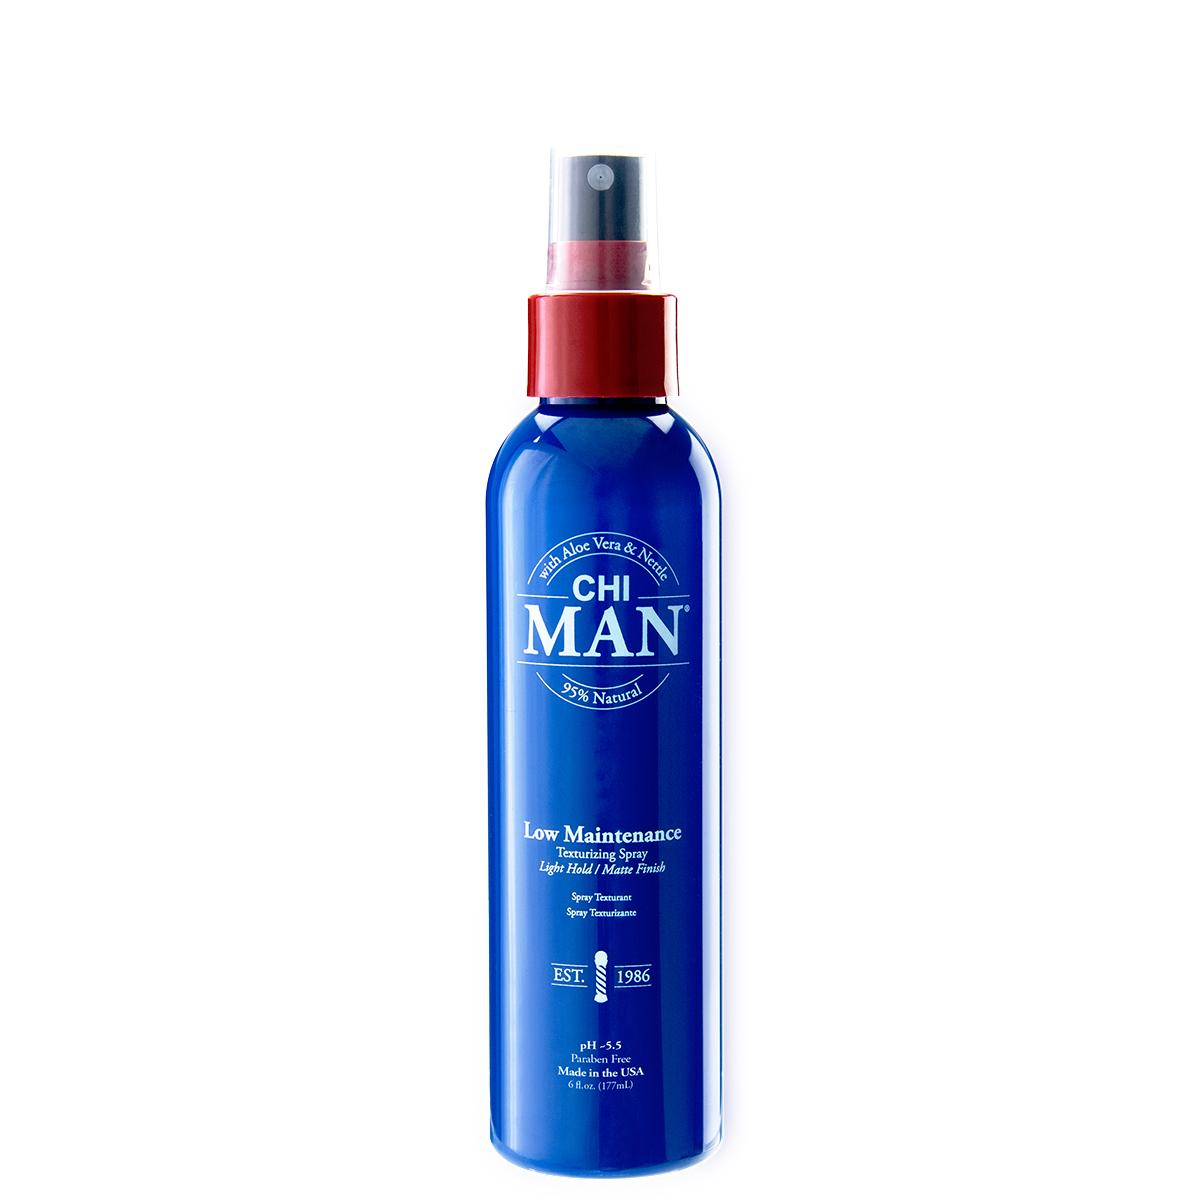 ТЕКСТУРИРАЩ СПРЕЙ С OUD АРОМАТ CHI Man Low Maintenance Texturizing Spray